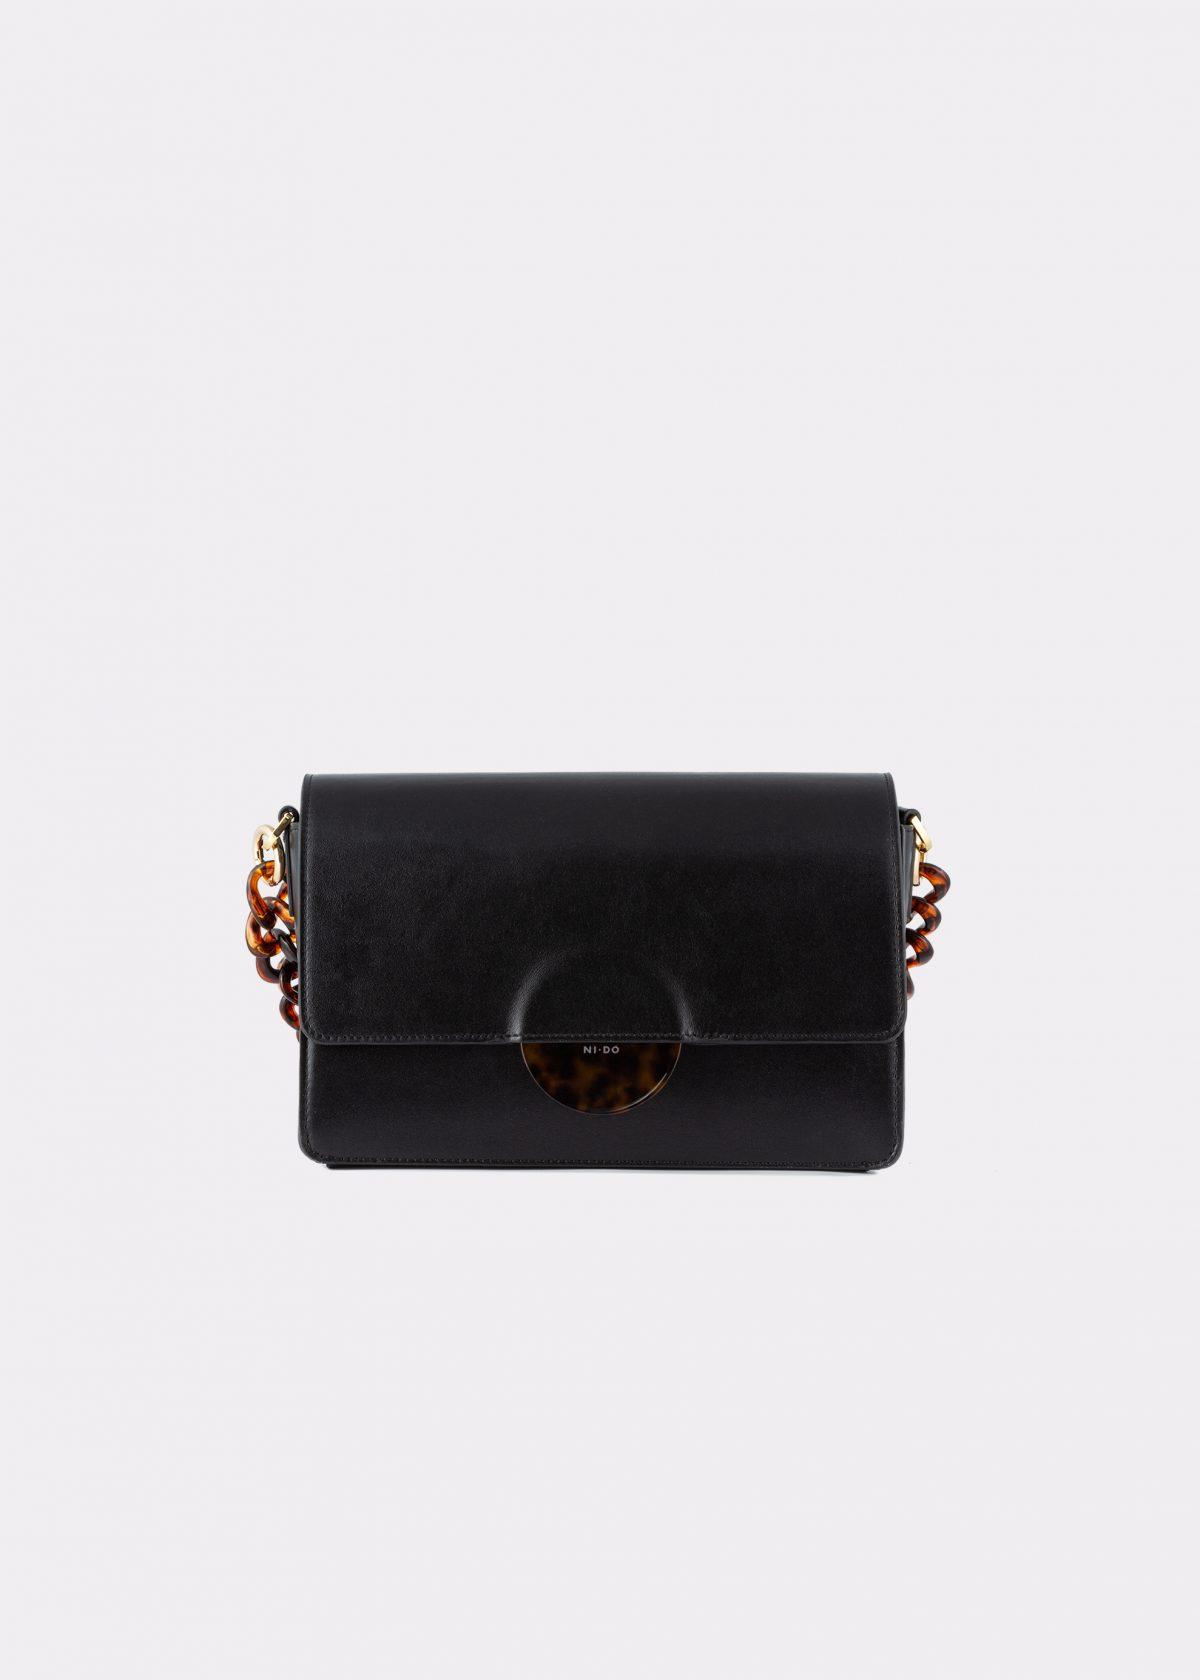 NIDO Cuore_Maxi bag black front view